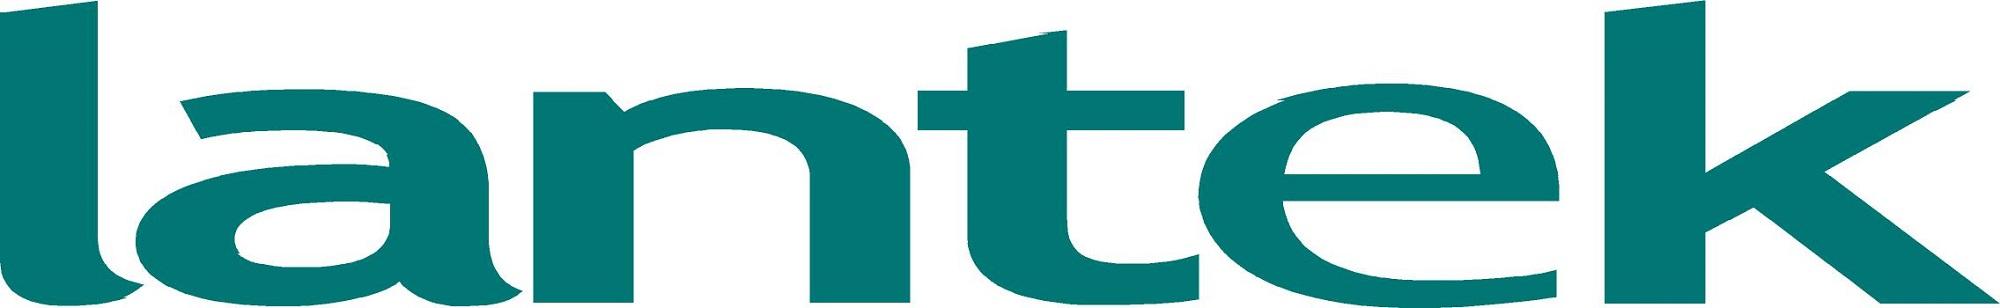 Lantek USA achieves nearly 9% revenue growth